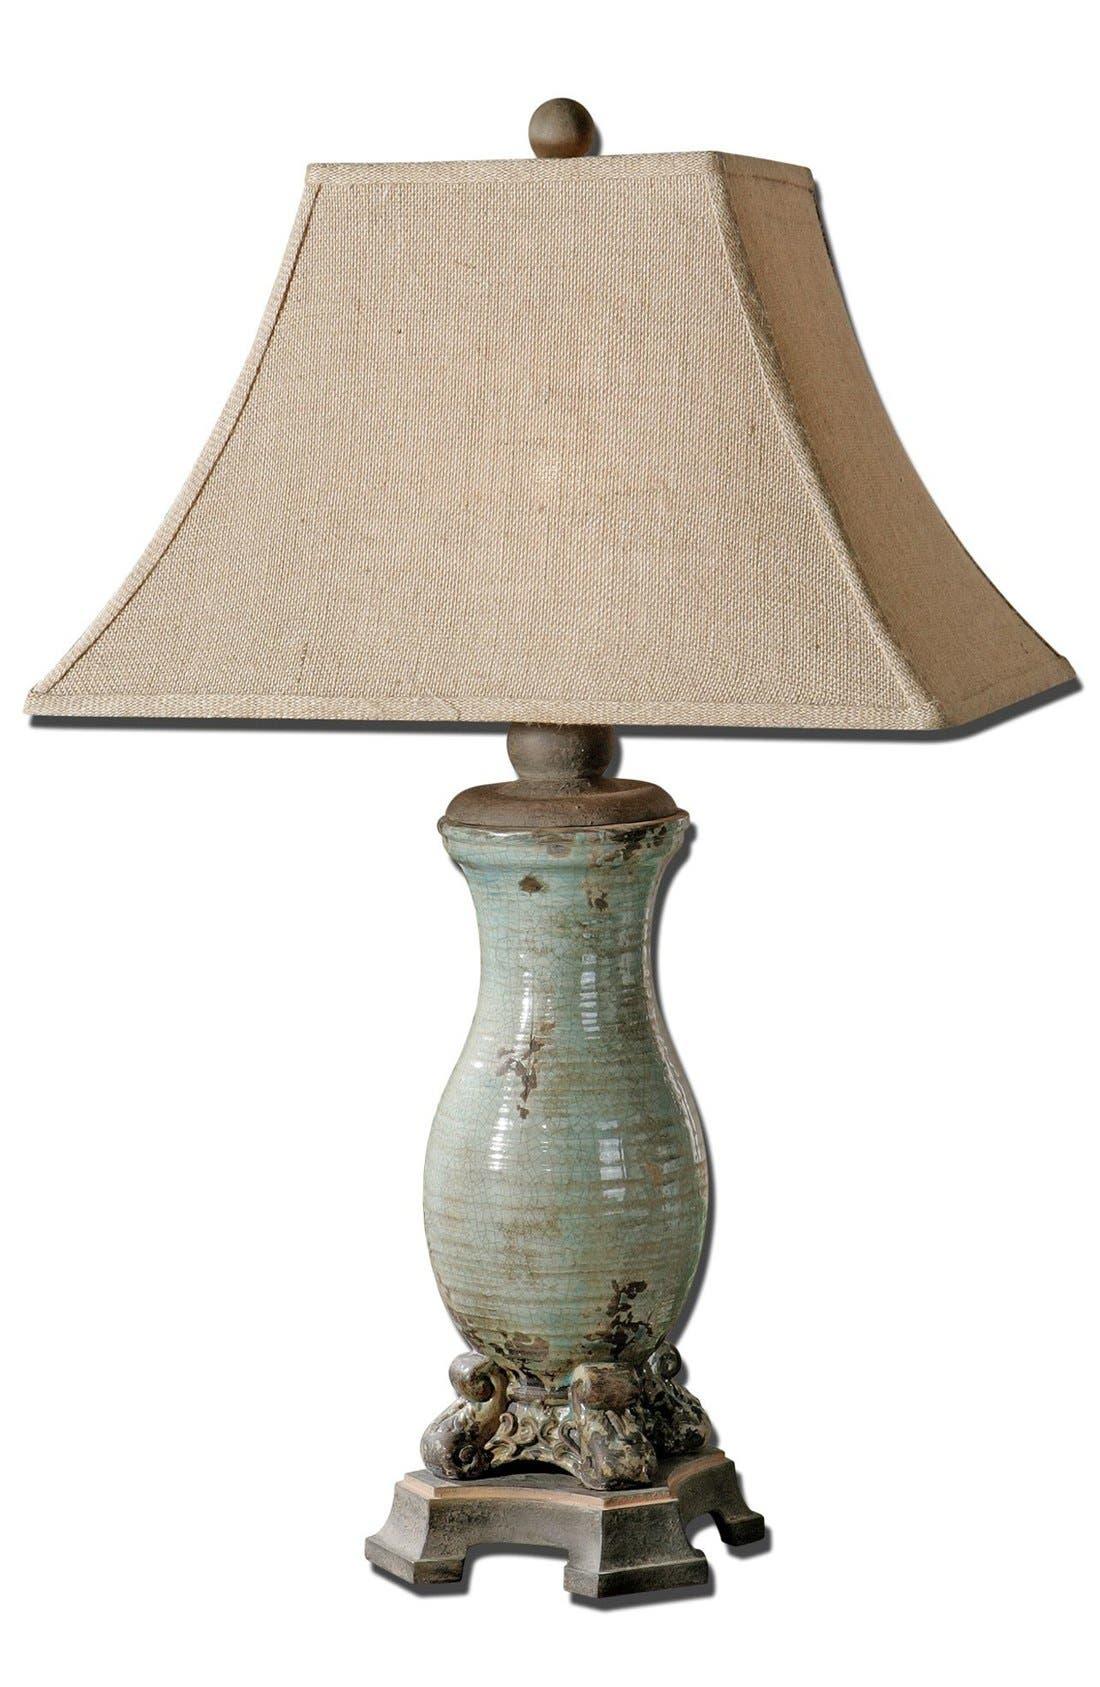 Main Image - Uttermost 'Andelle' Glazed Ceramic Table Lamp